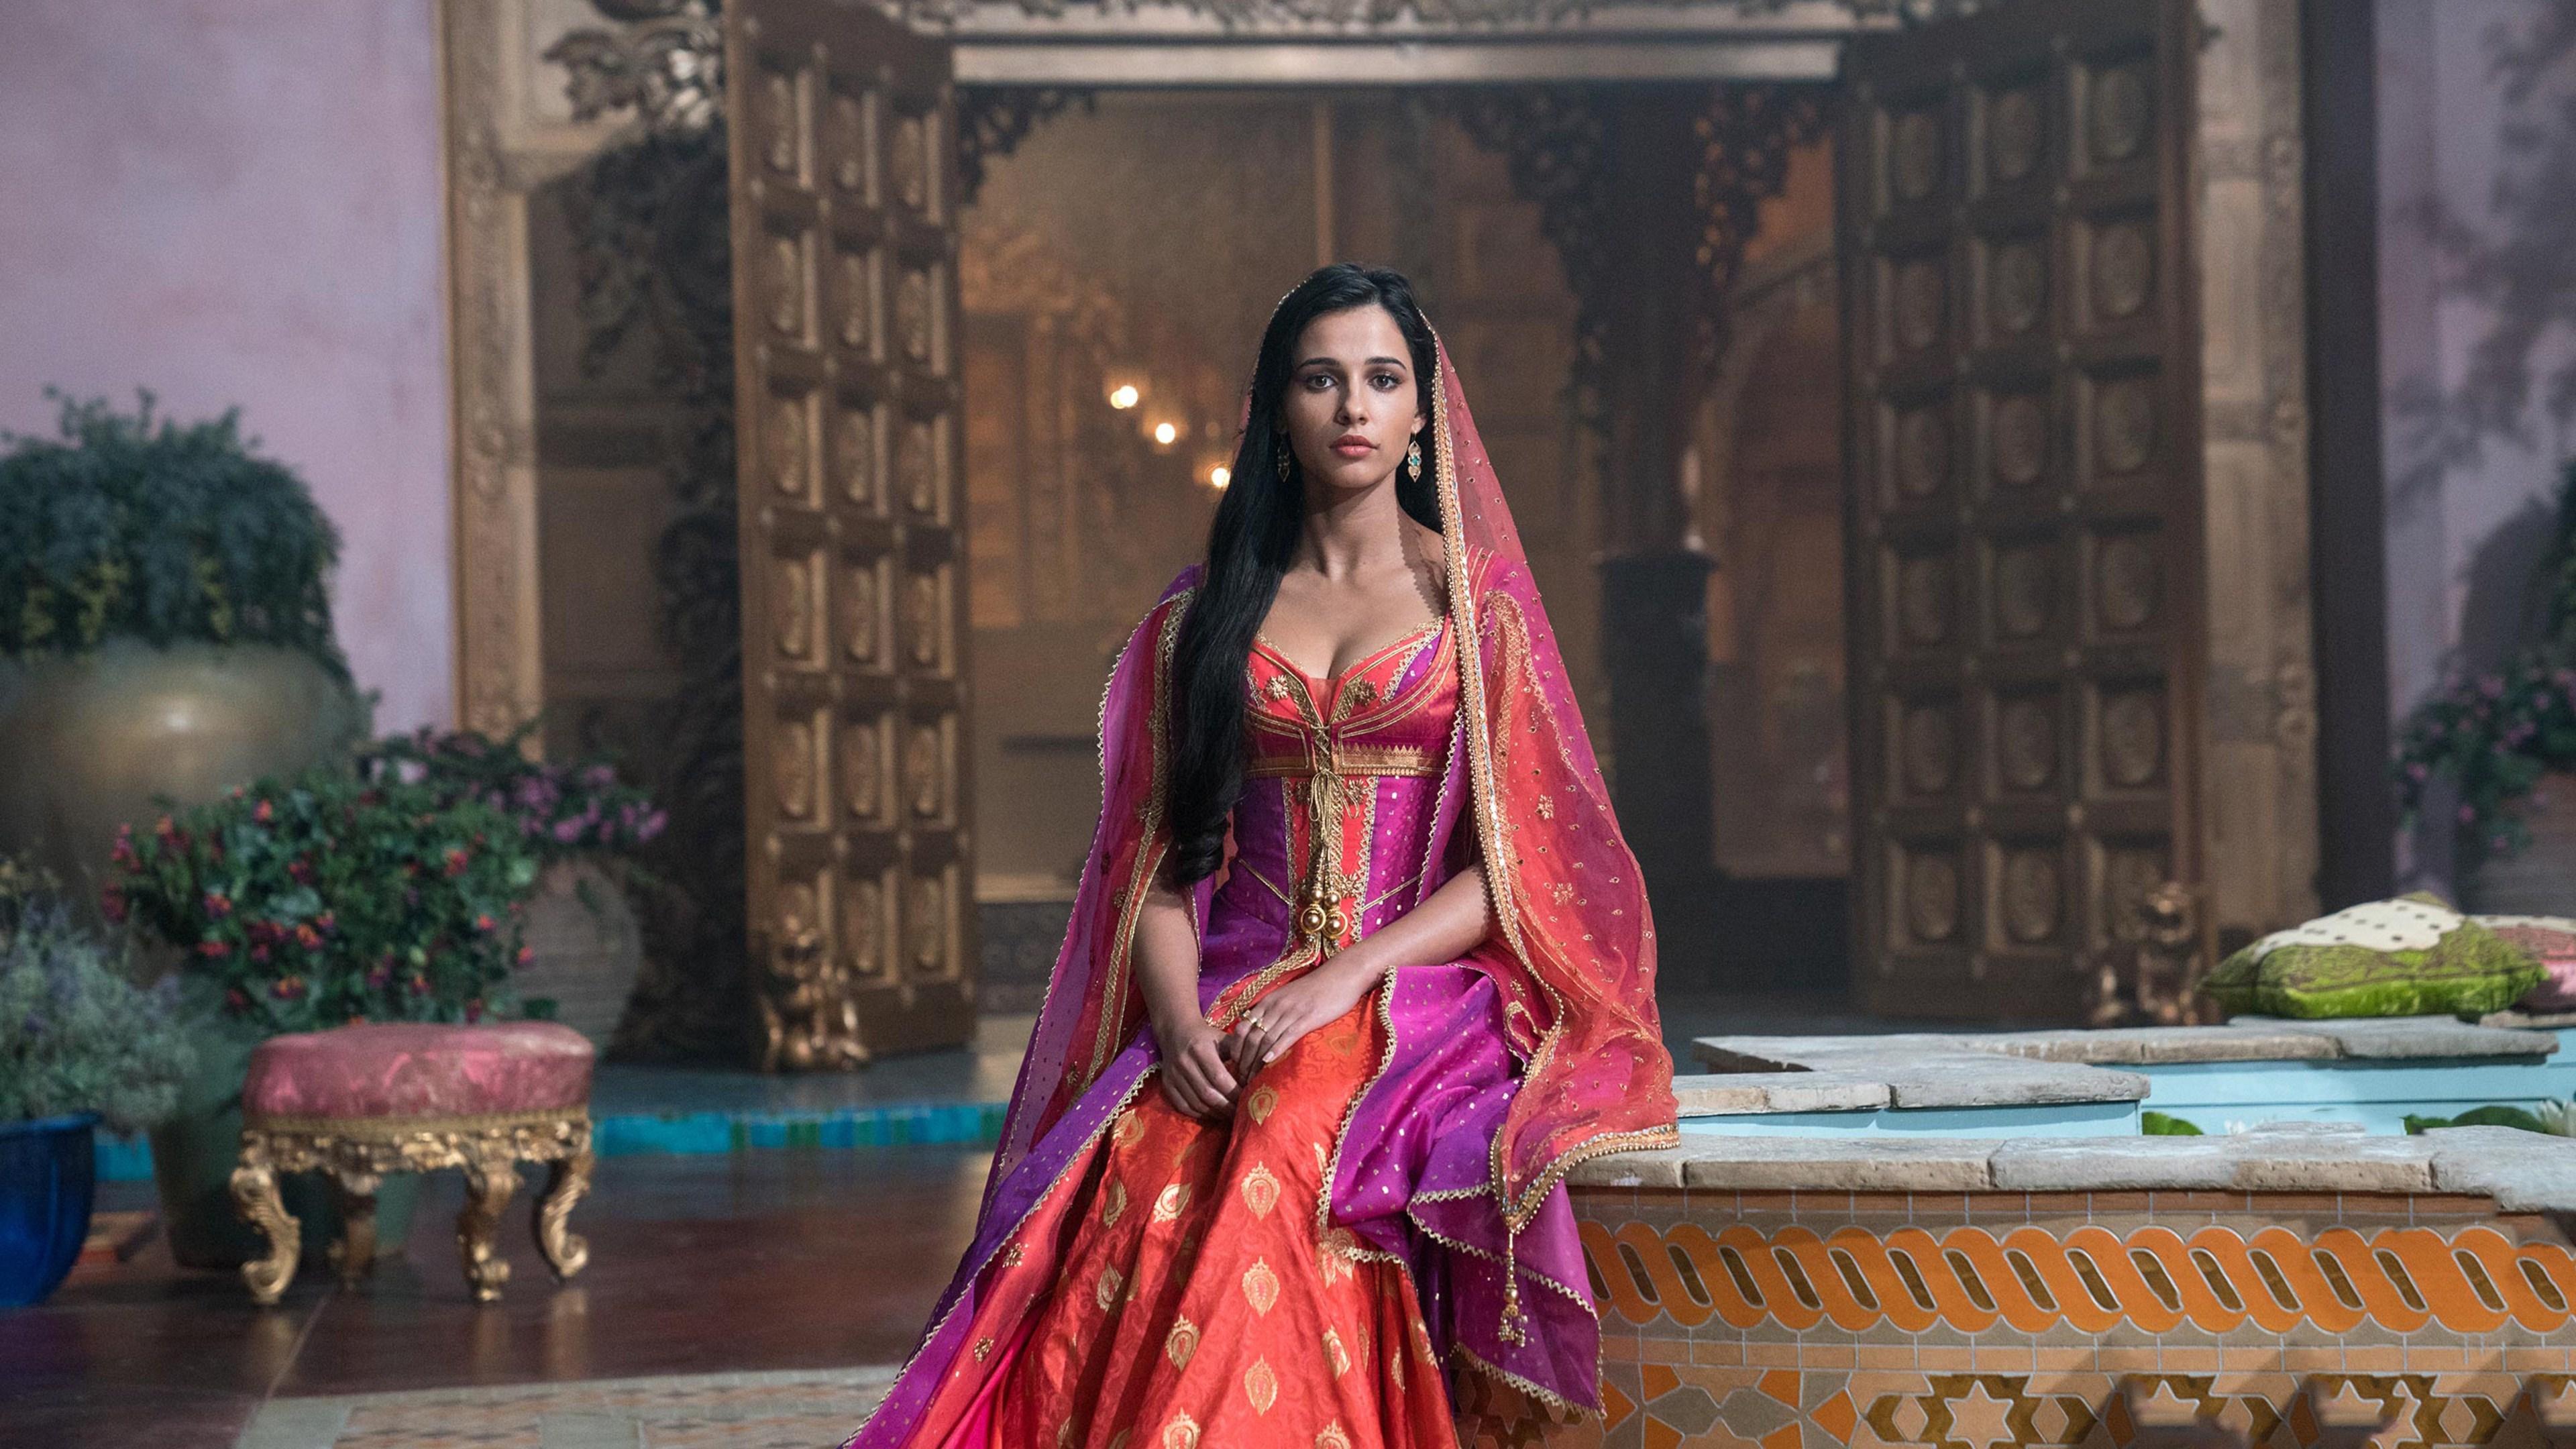 4k Wallpaper Naomi Scott Aladdin Movie 2019 4721 Wallpapers and 3840x2160